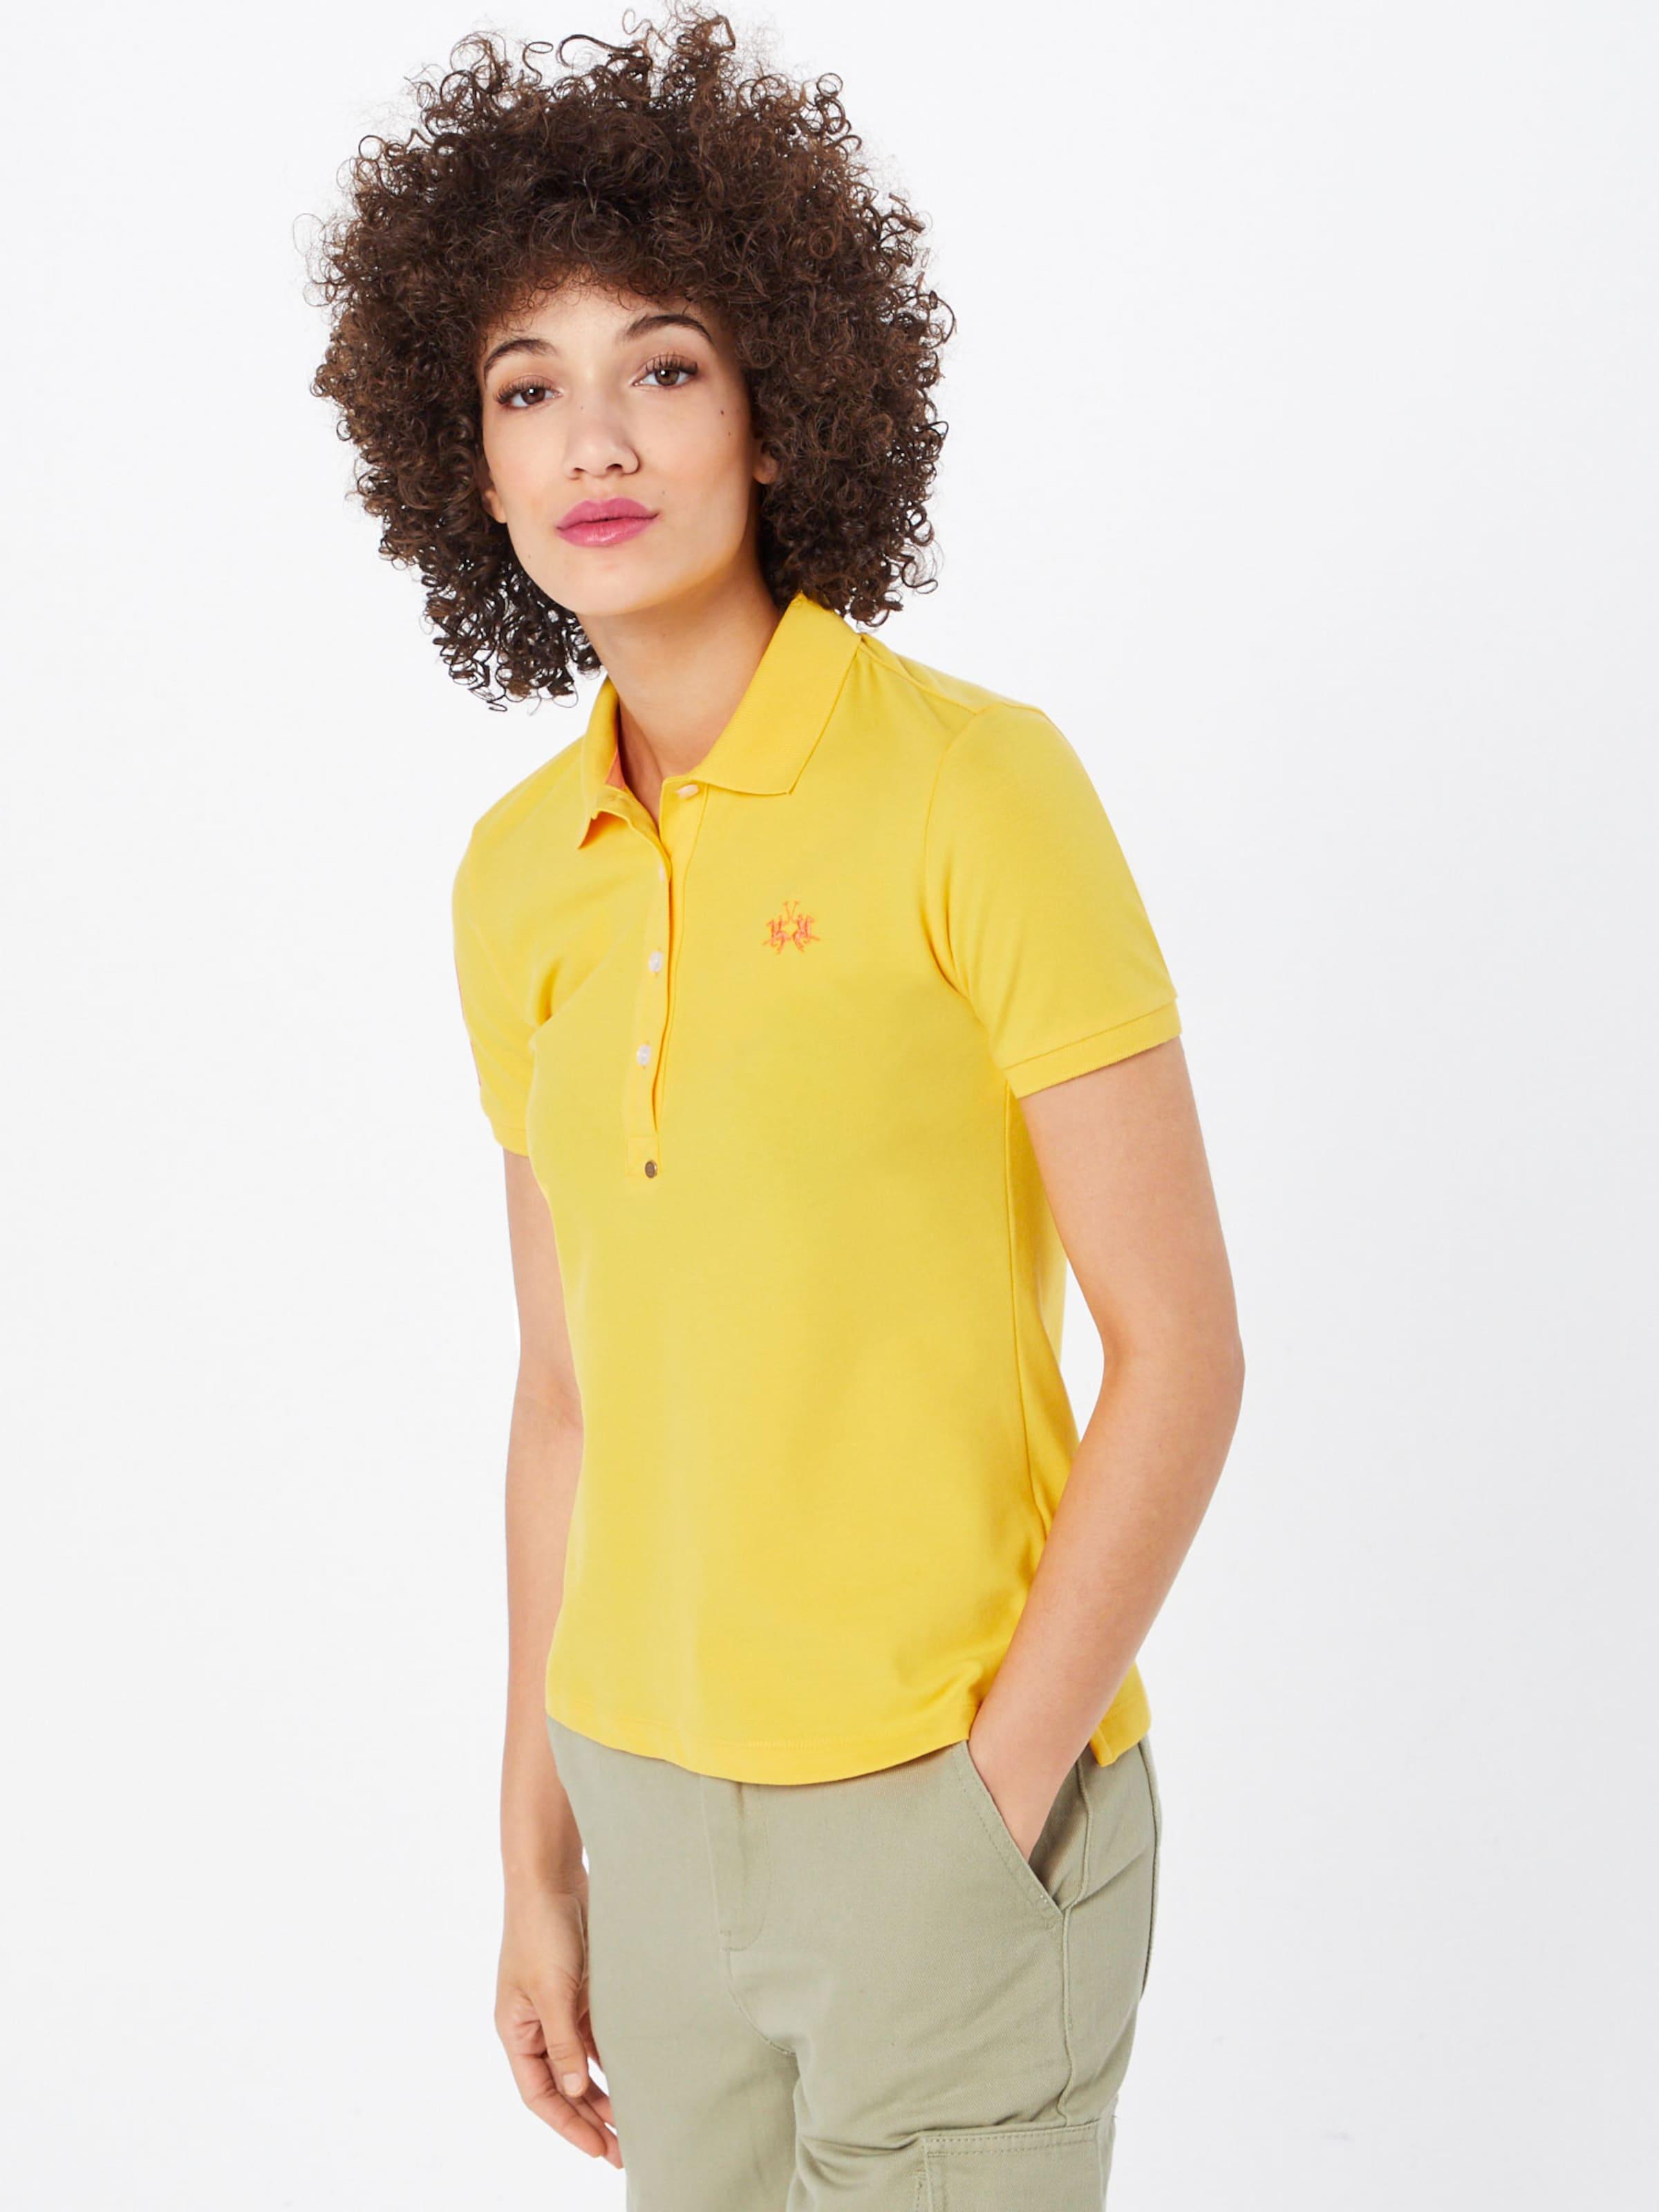 shirt Martina 'woman Polo En La Blanc Stretch' Piquet T yfgb6Y7